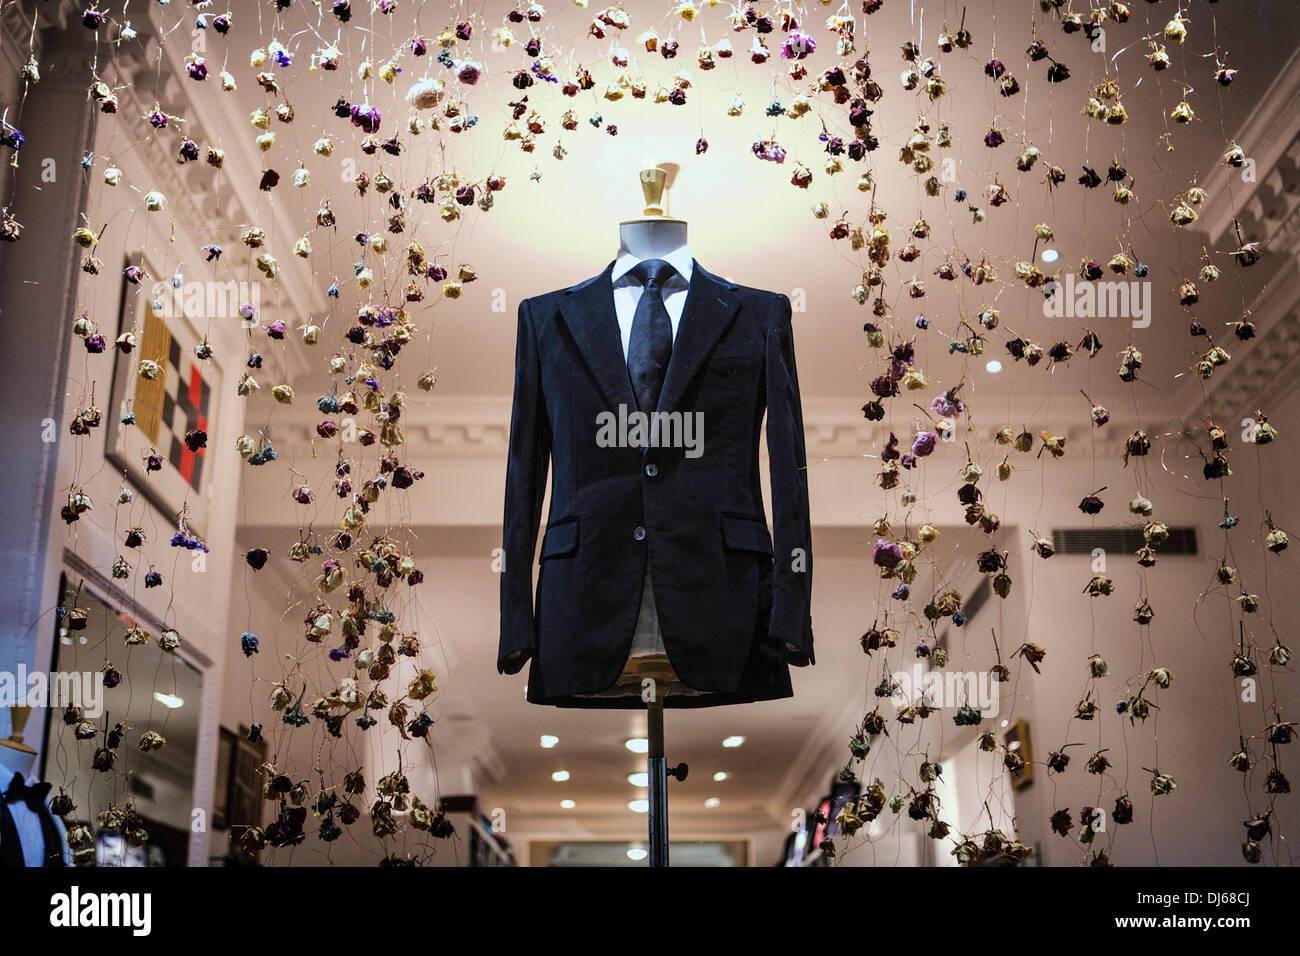 Savile Row British Bespoke tailoring London shop window display. Savile row bespoke. - Stock Image